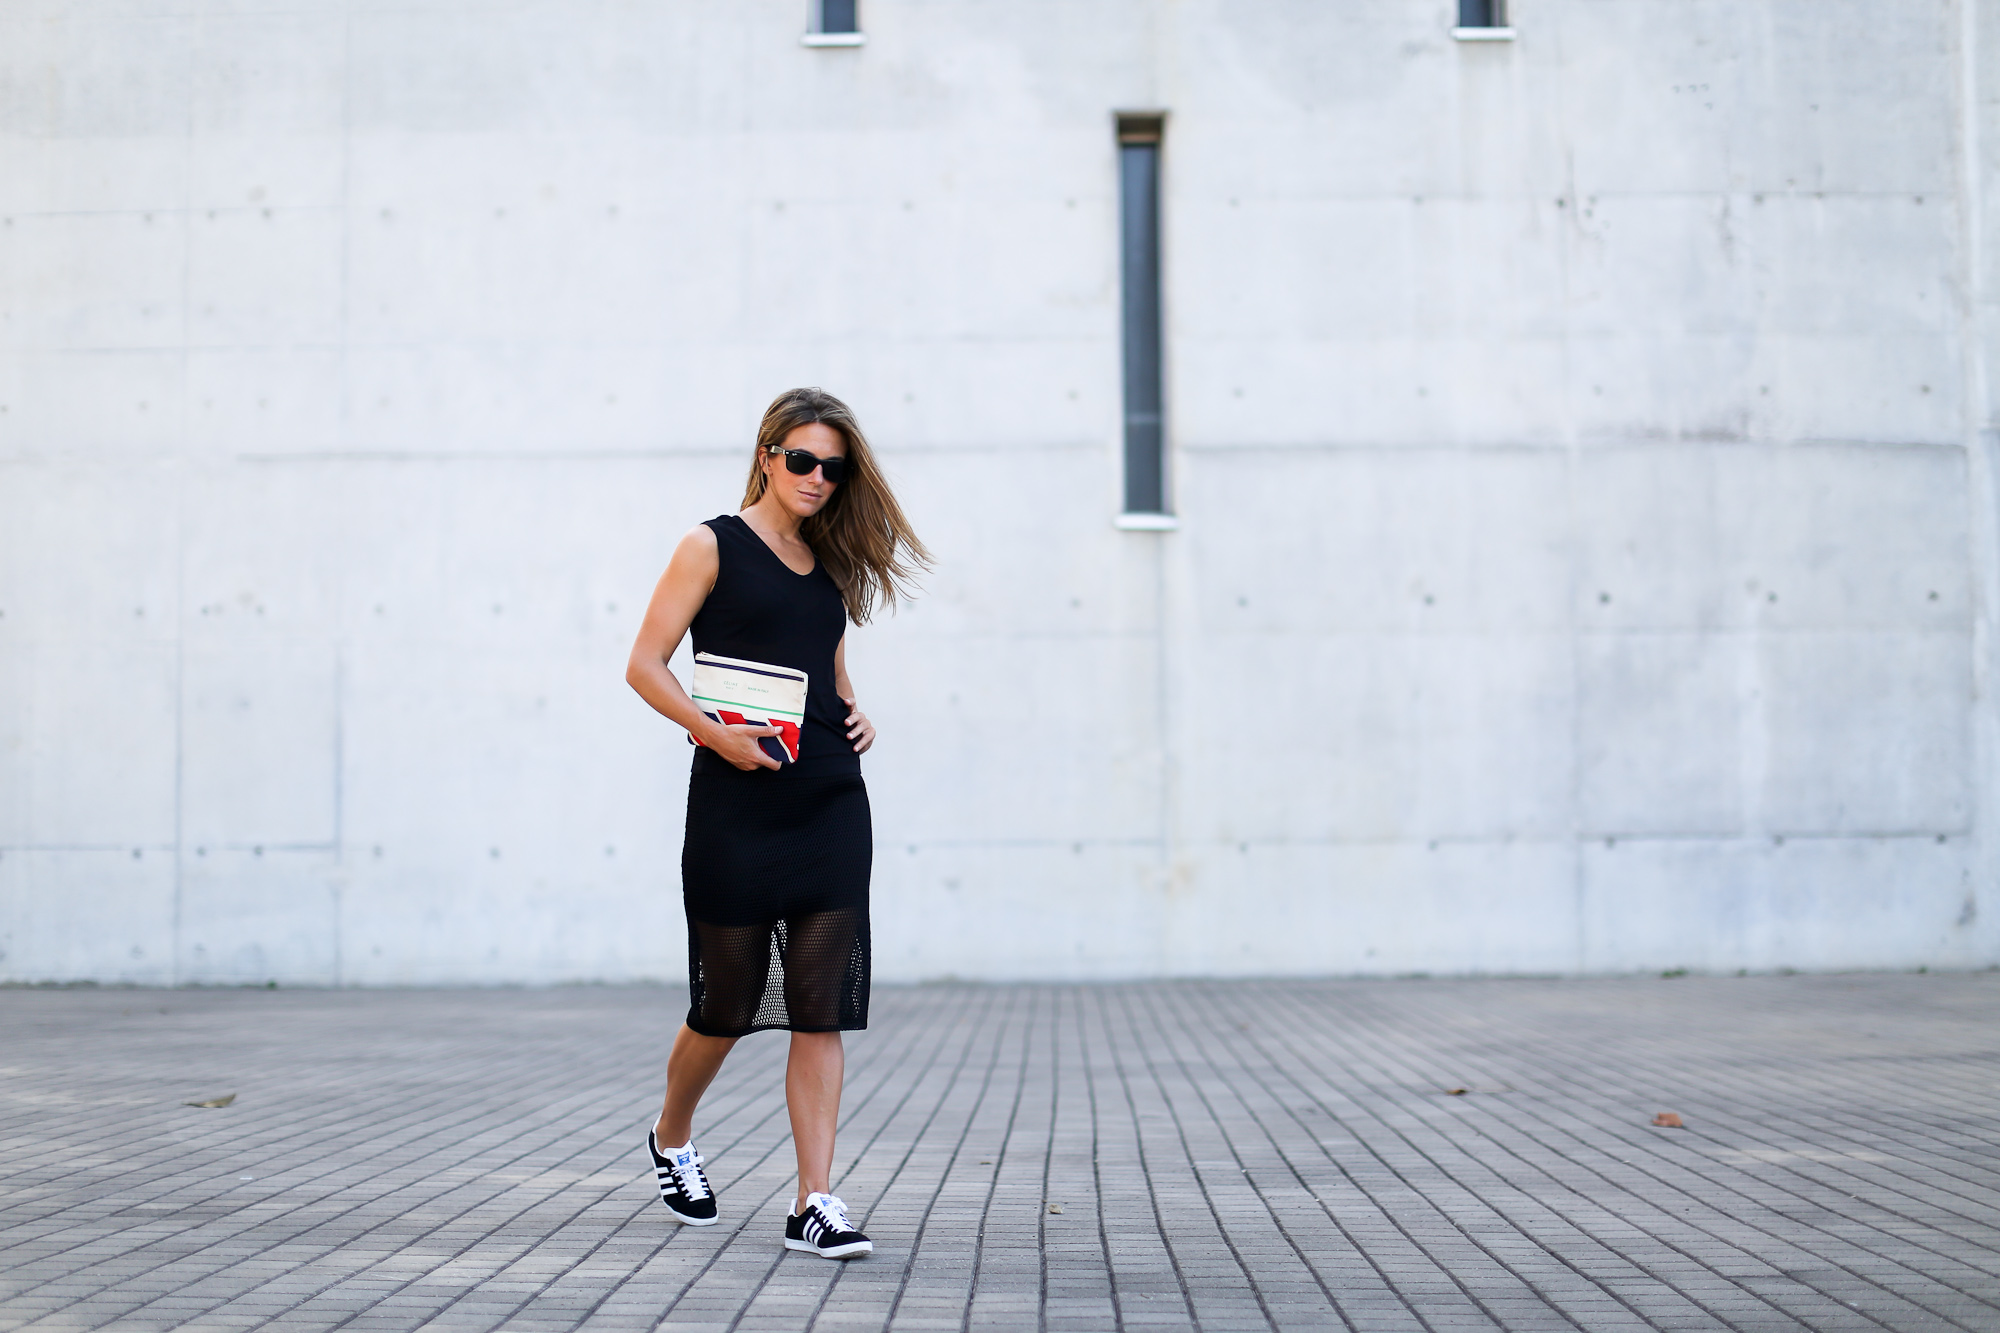 Clochet_streetstyle_adidas_gazelle_black_leztinstreet_celine_paris_clutch-2